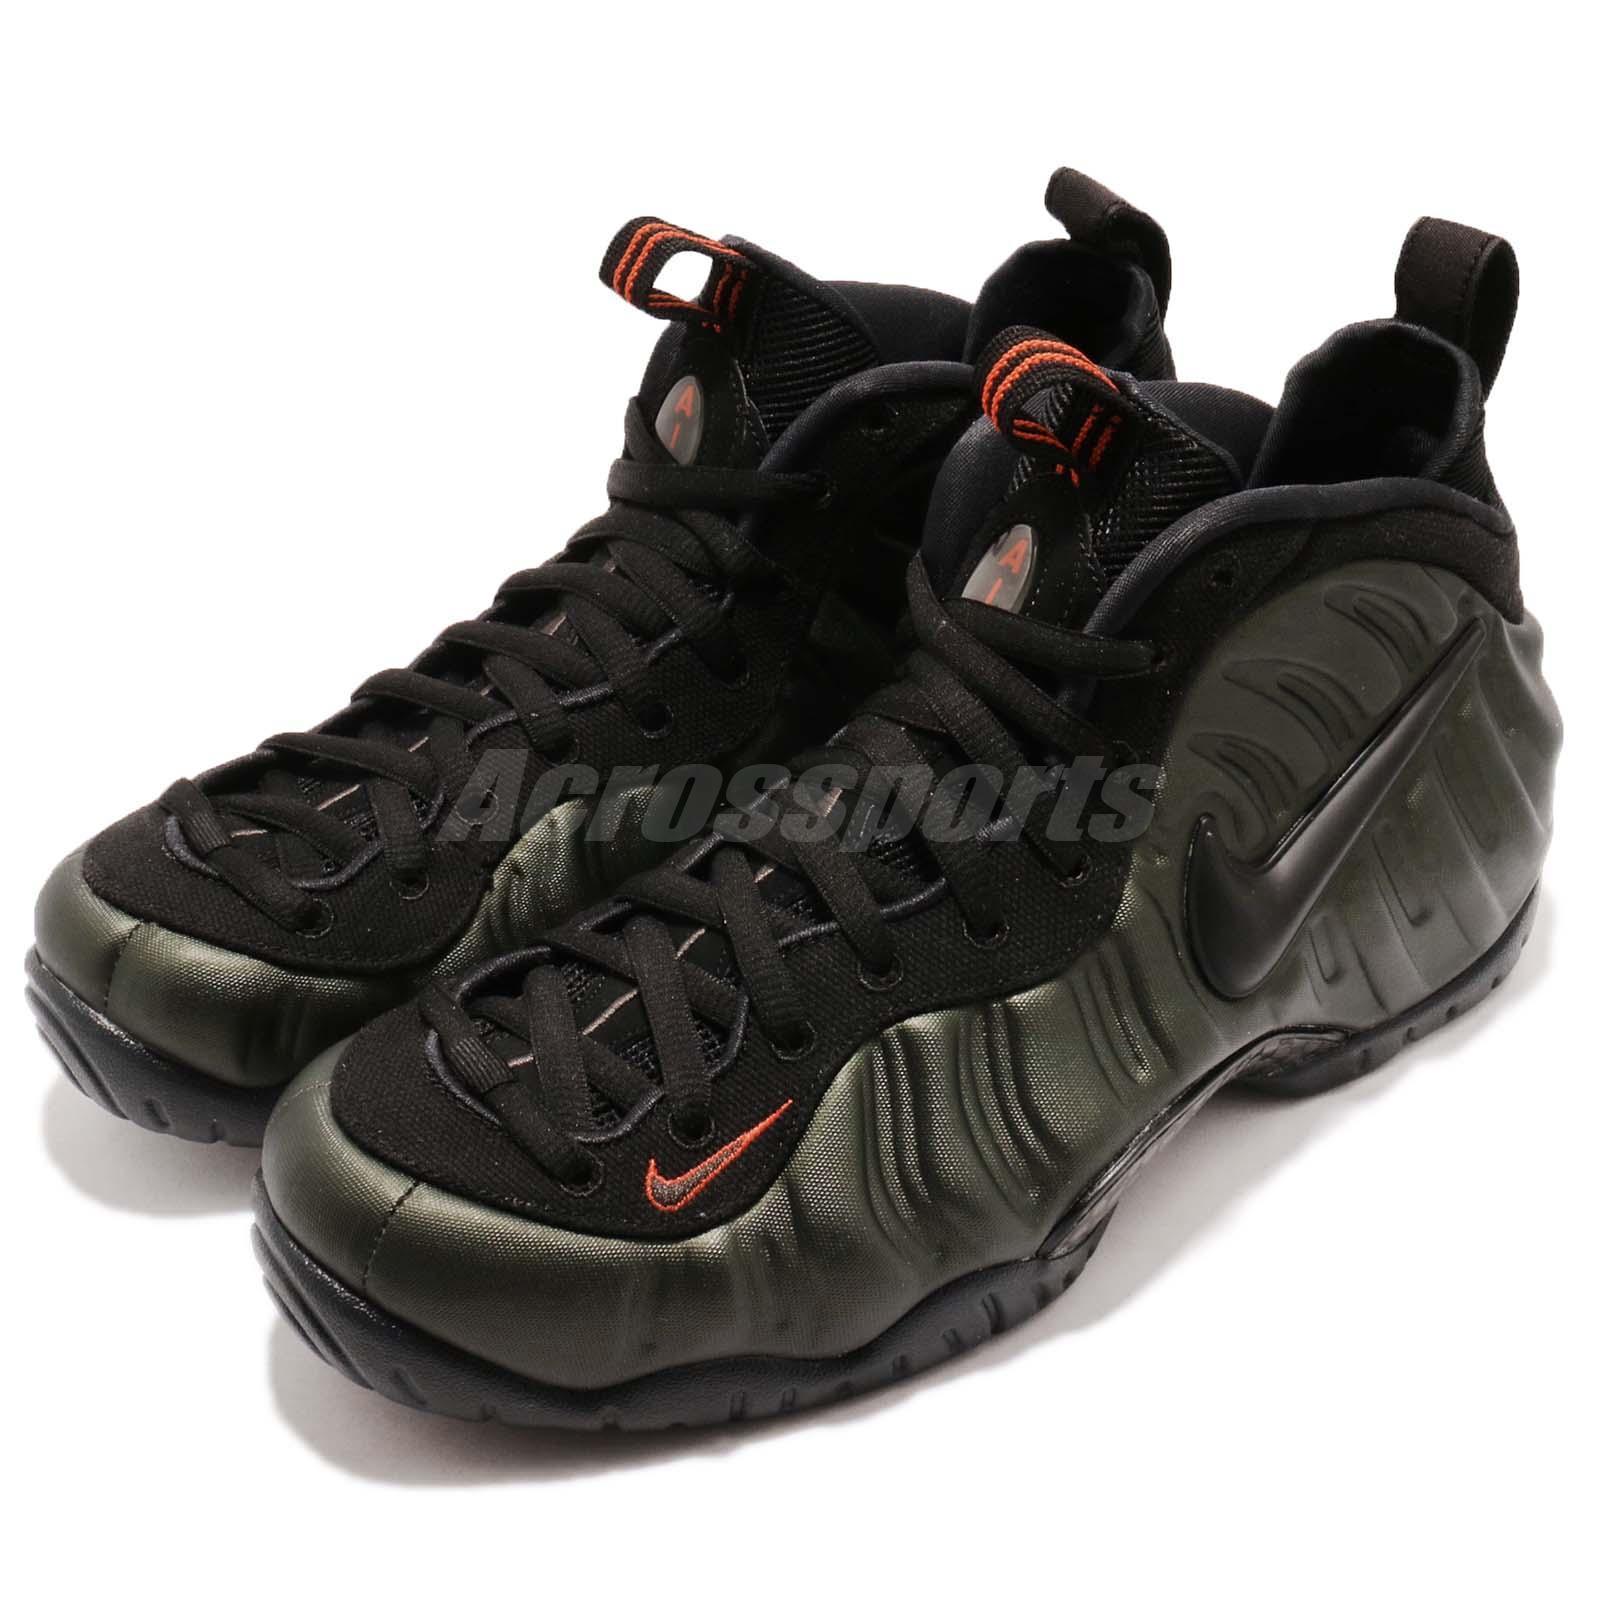 1f540cb340a Details about Nike Air Foamposite Pro Sequoia Black Team Orange Men Shoes  Sneakers 624041-304